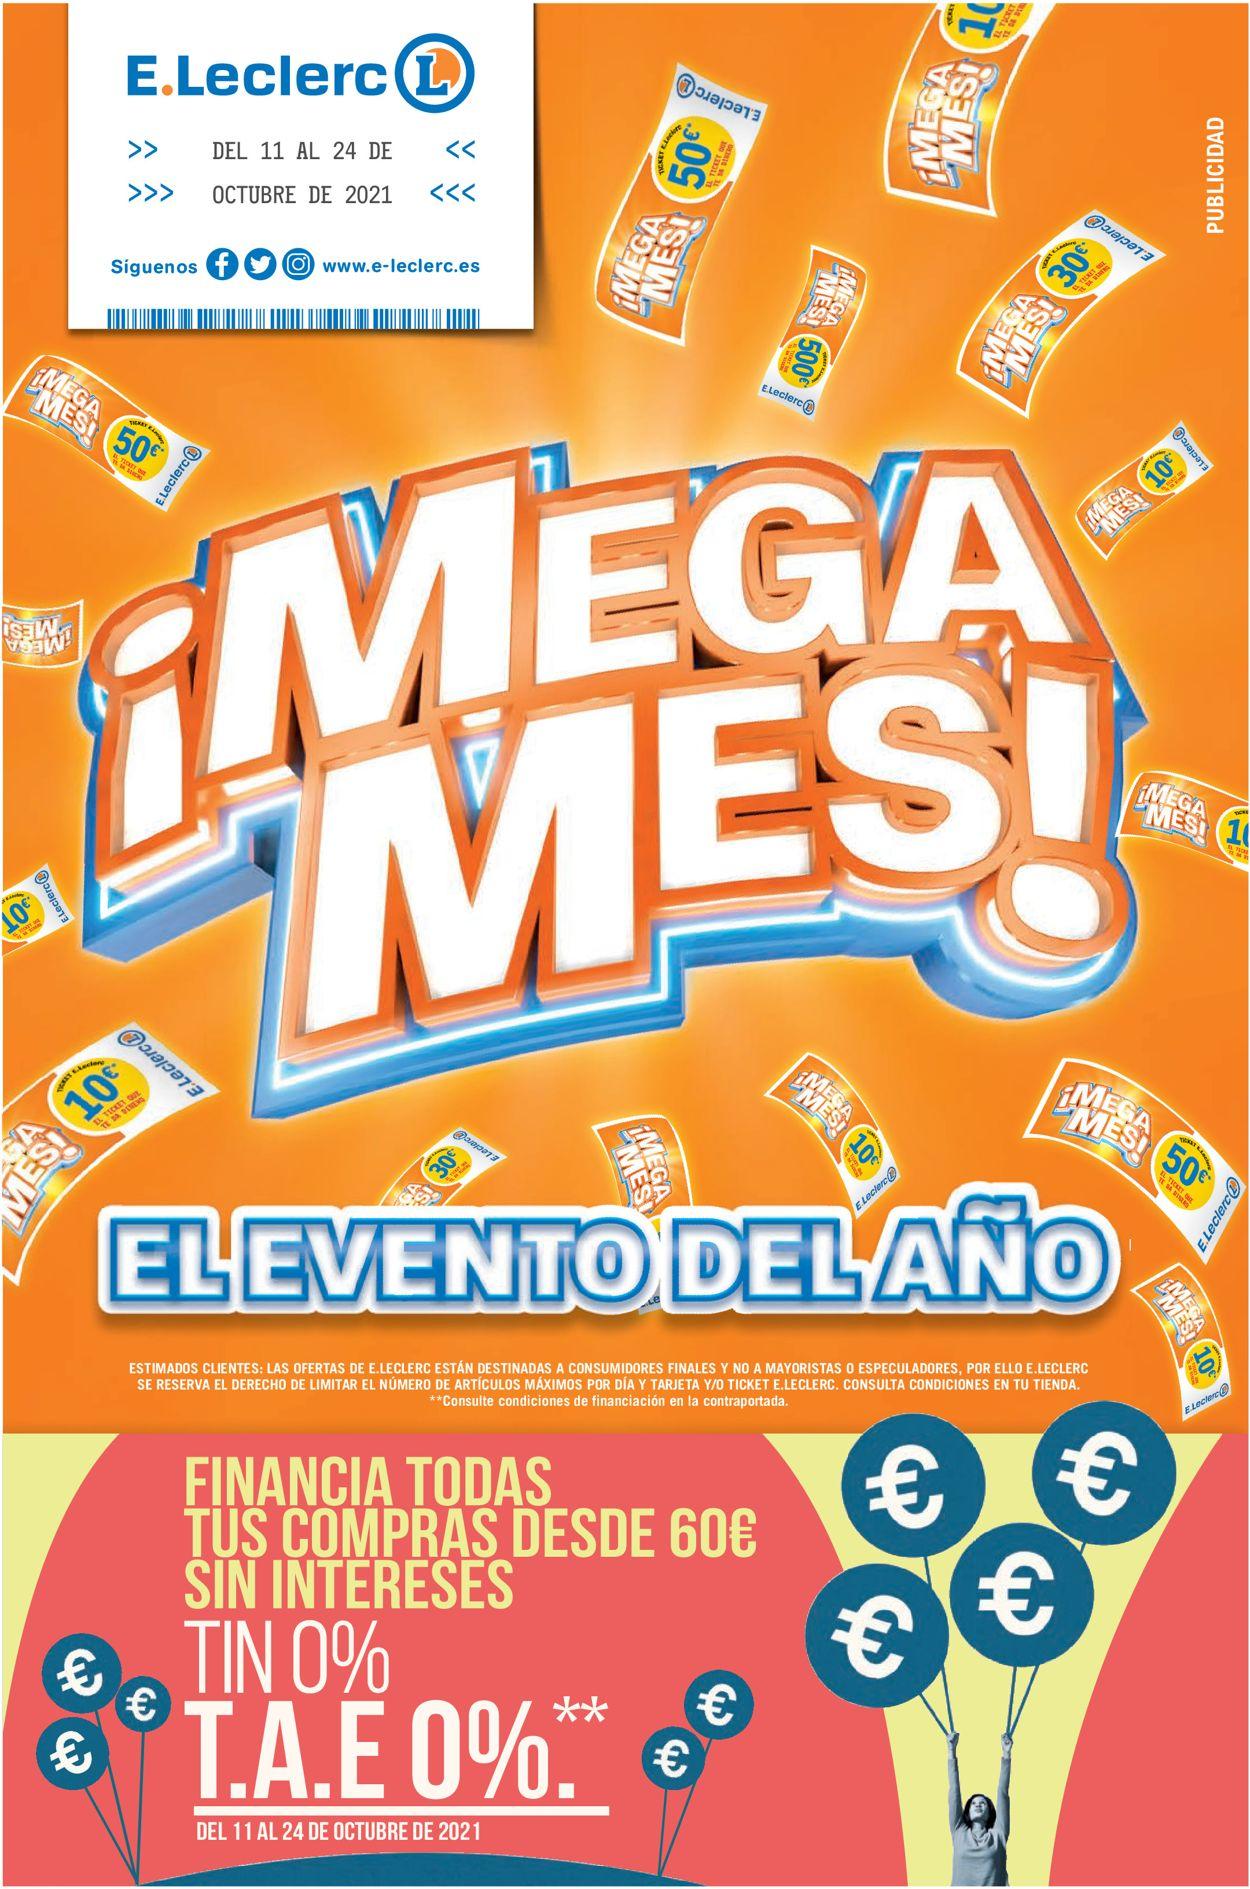 E.leclerc Folleto - 11.10-24.10.2021